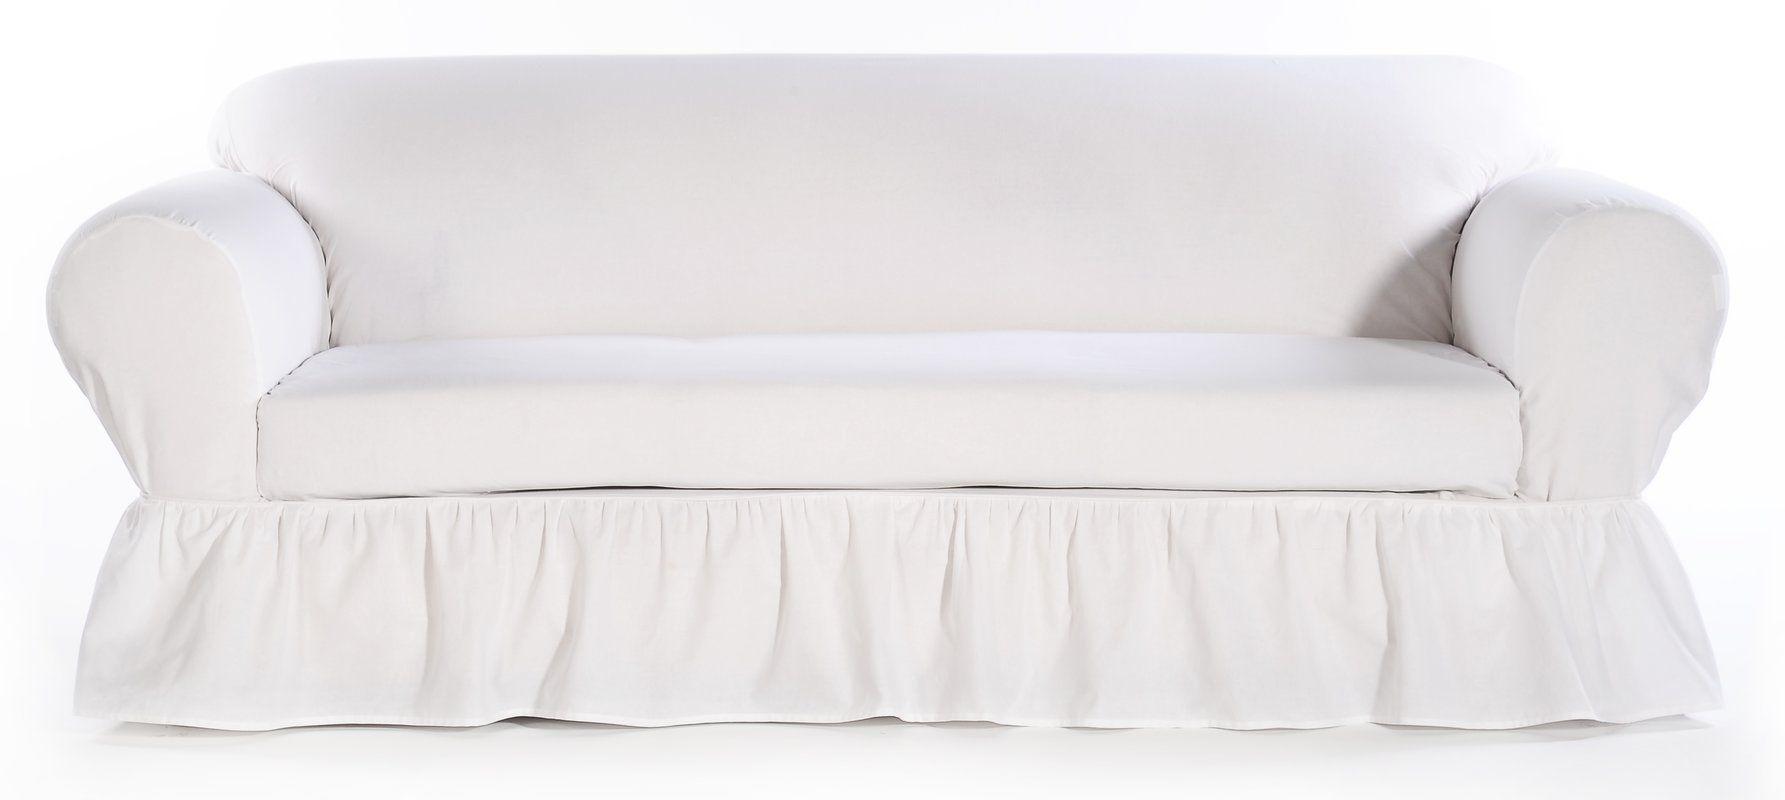 Sofa Skirted Box Cushion Sofa Slipcover With Images White Slipcover Sofa Slipcovers For Chairs Slipcovers